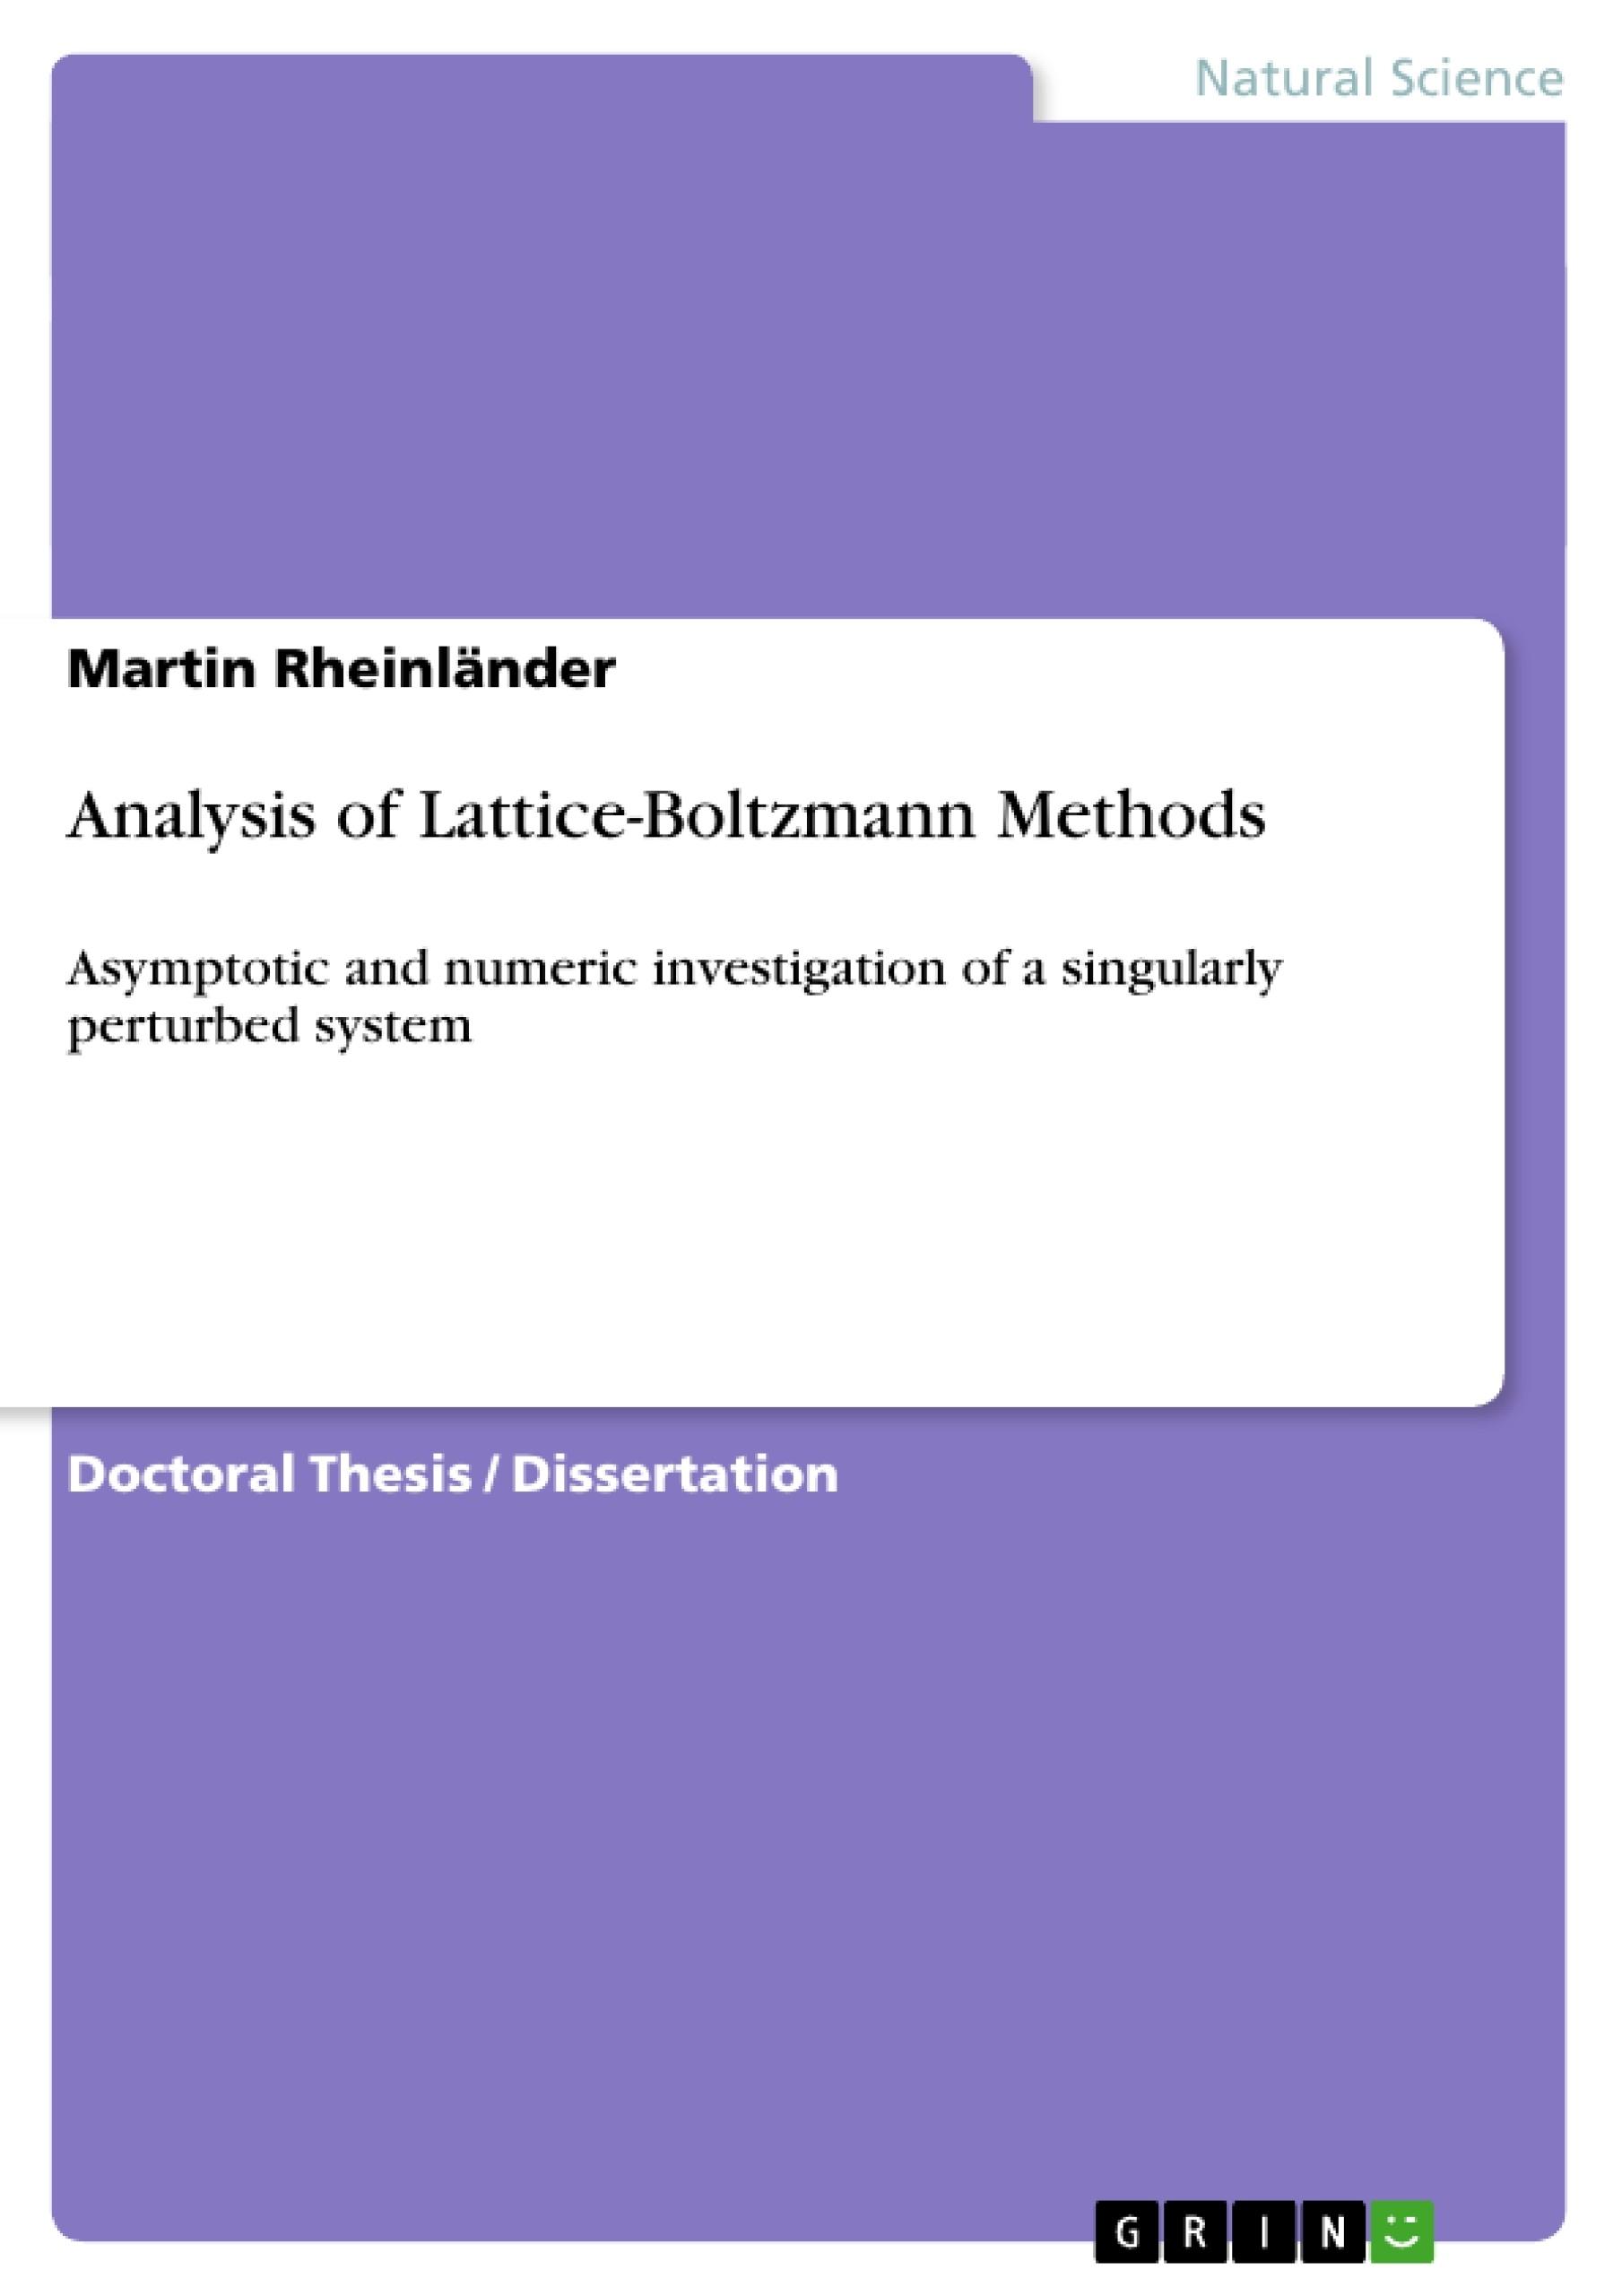 Title: Analysis of Lattice-Boltzmann Methods